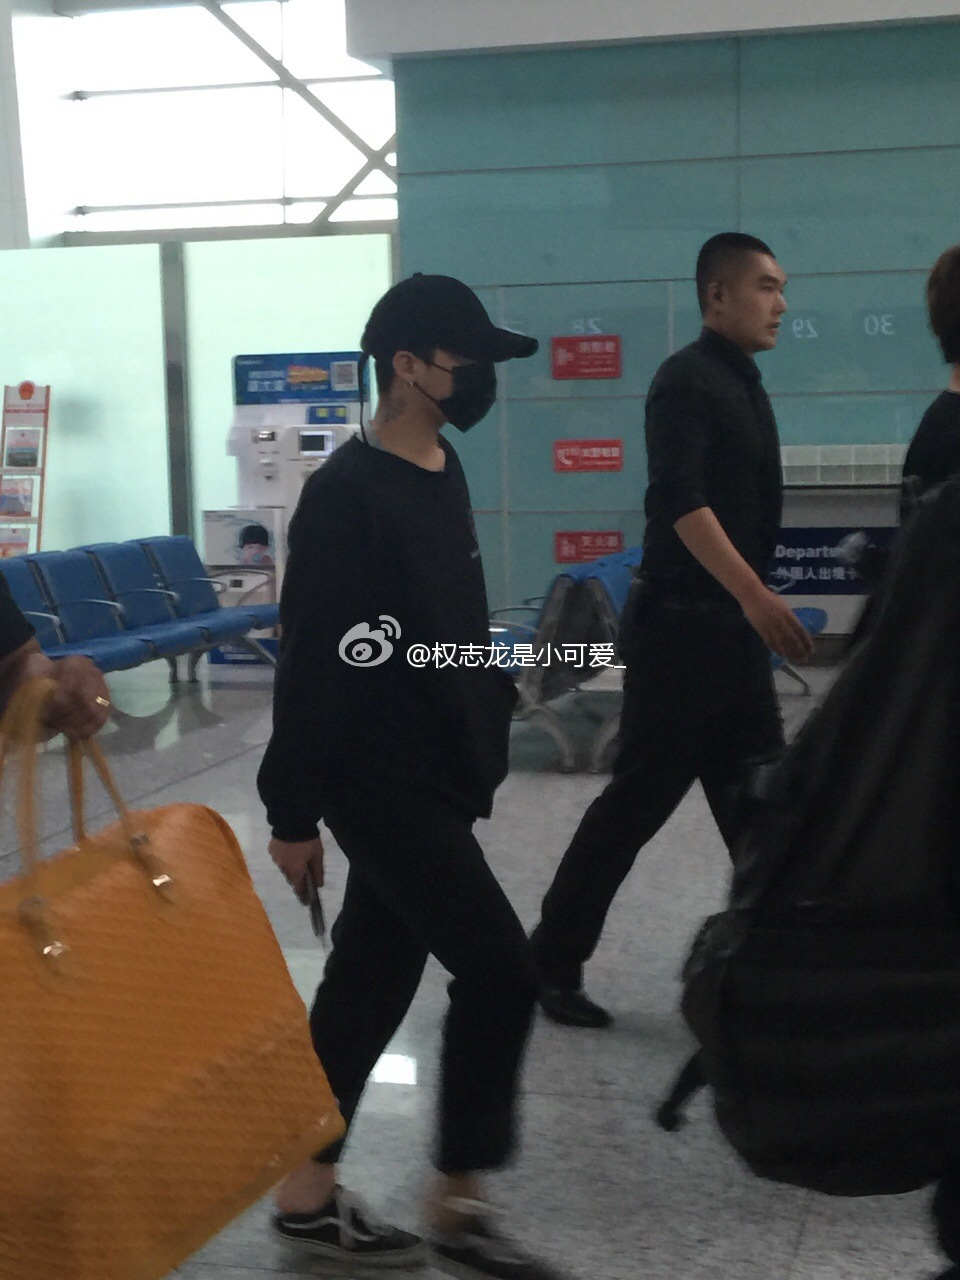 BIGBANG Departure Dalian 2016-06-26 (19)